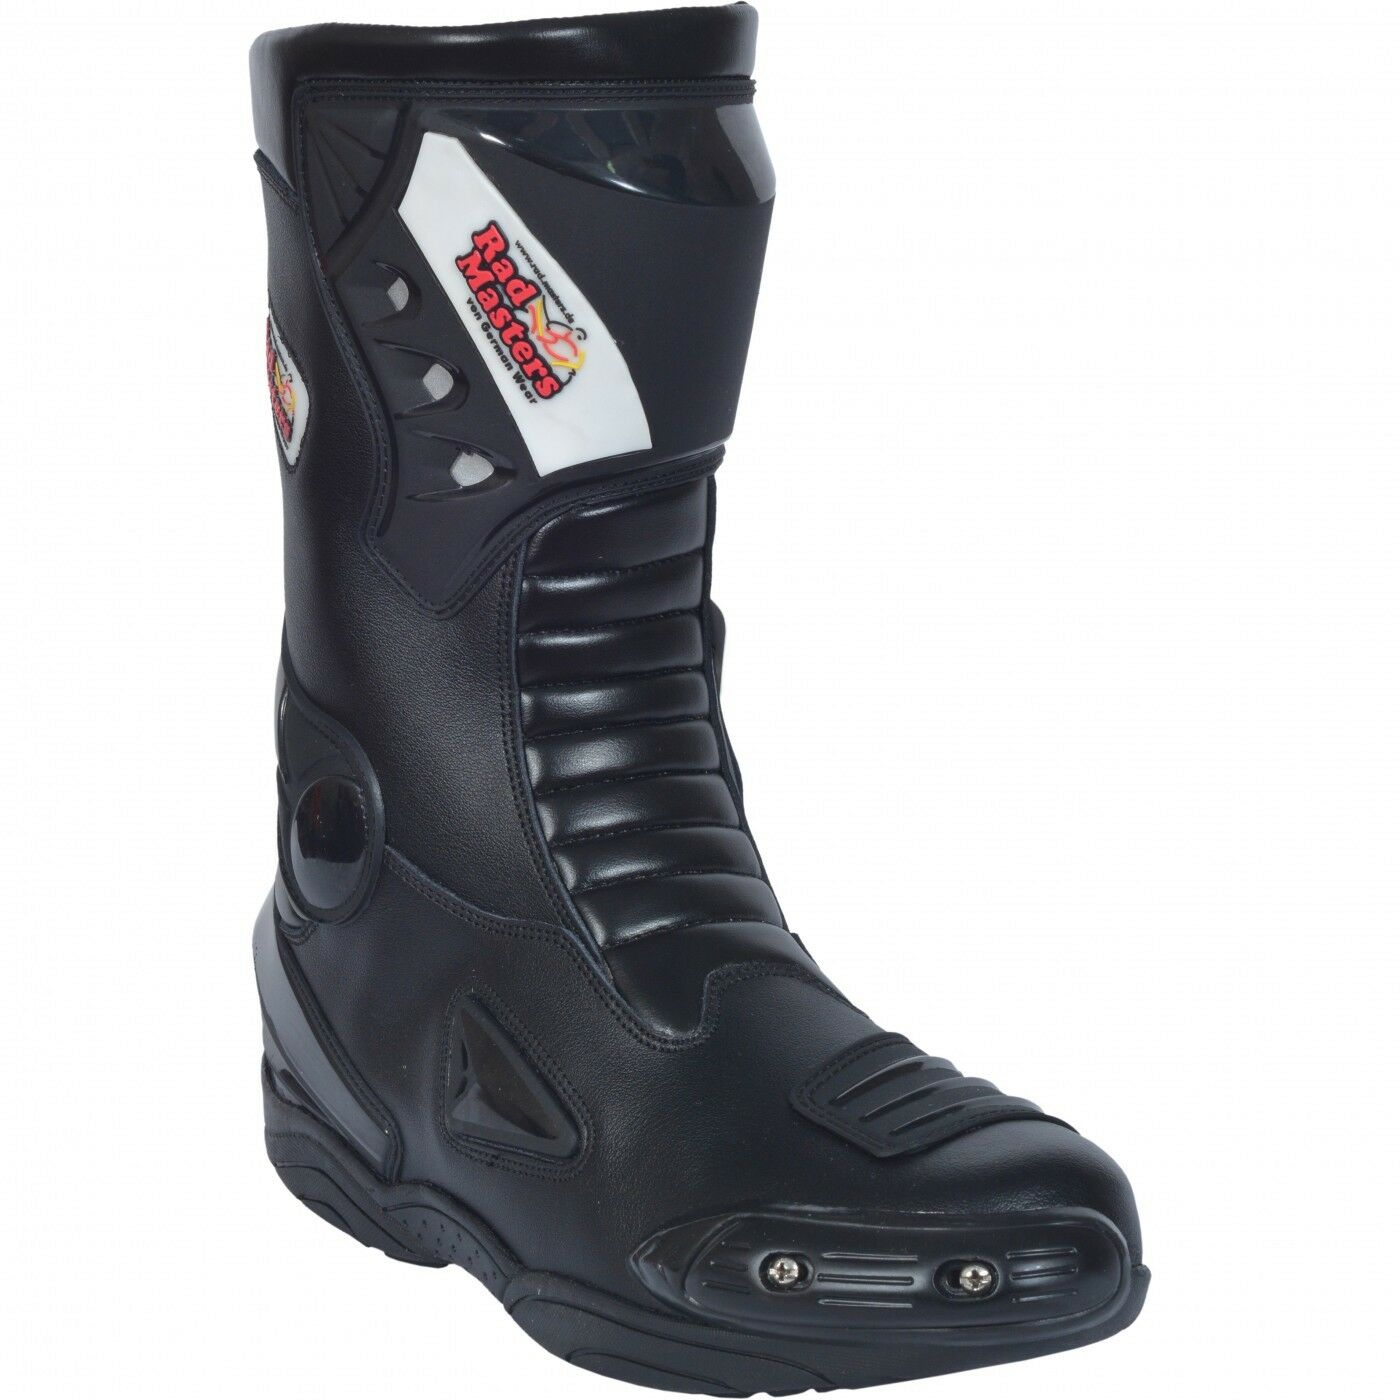 Gerhomme Wear, Moto Bottes Moto Motard Sport Toubague Bottes Noir 32 cm